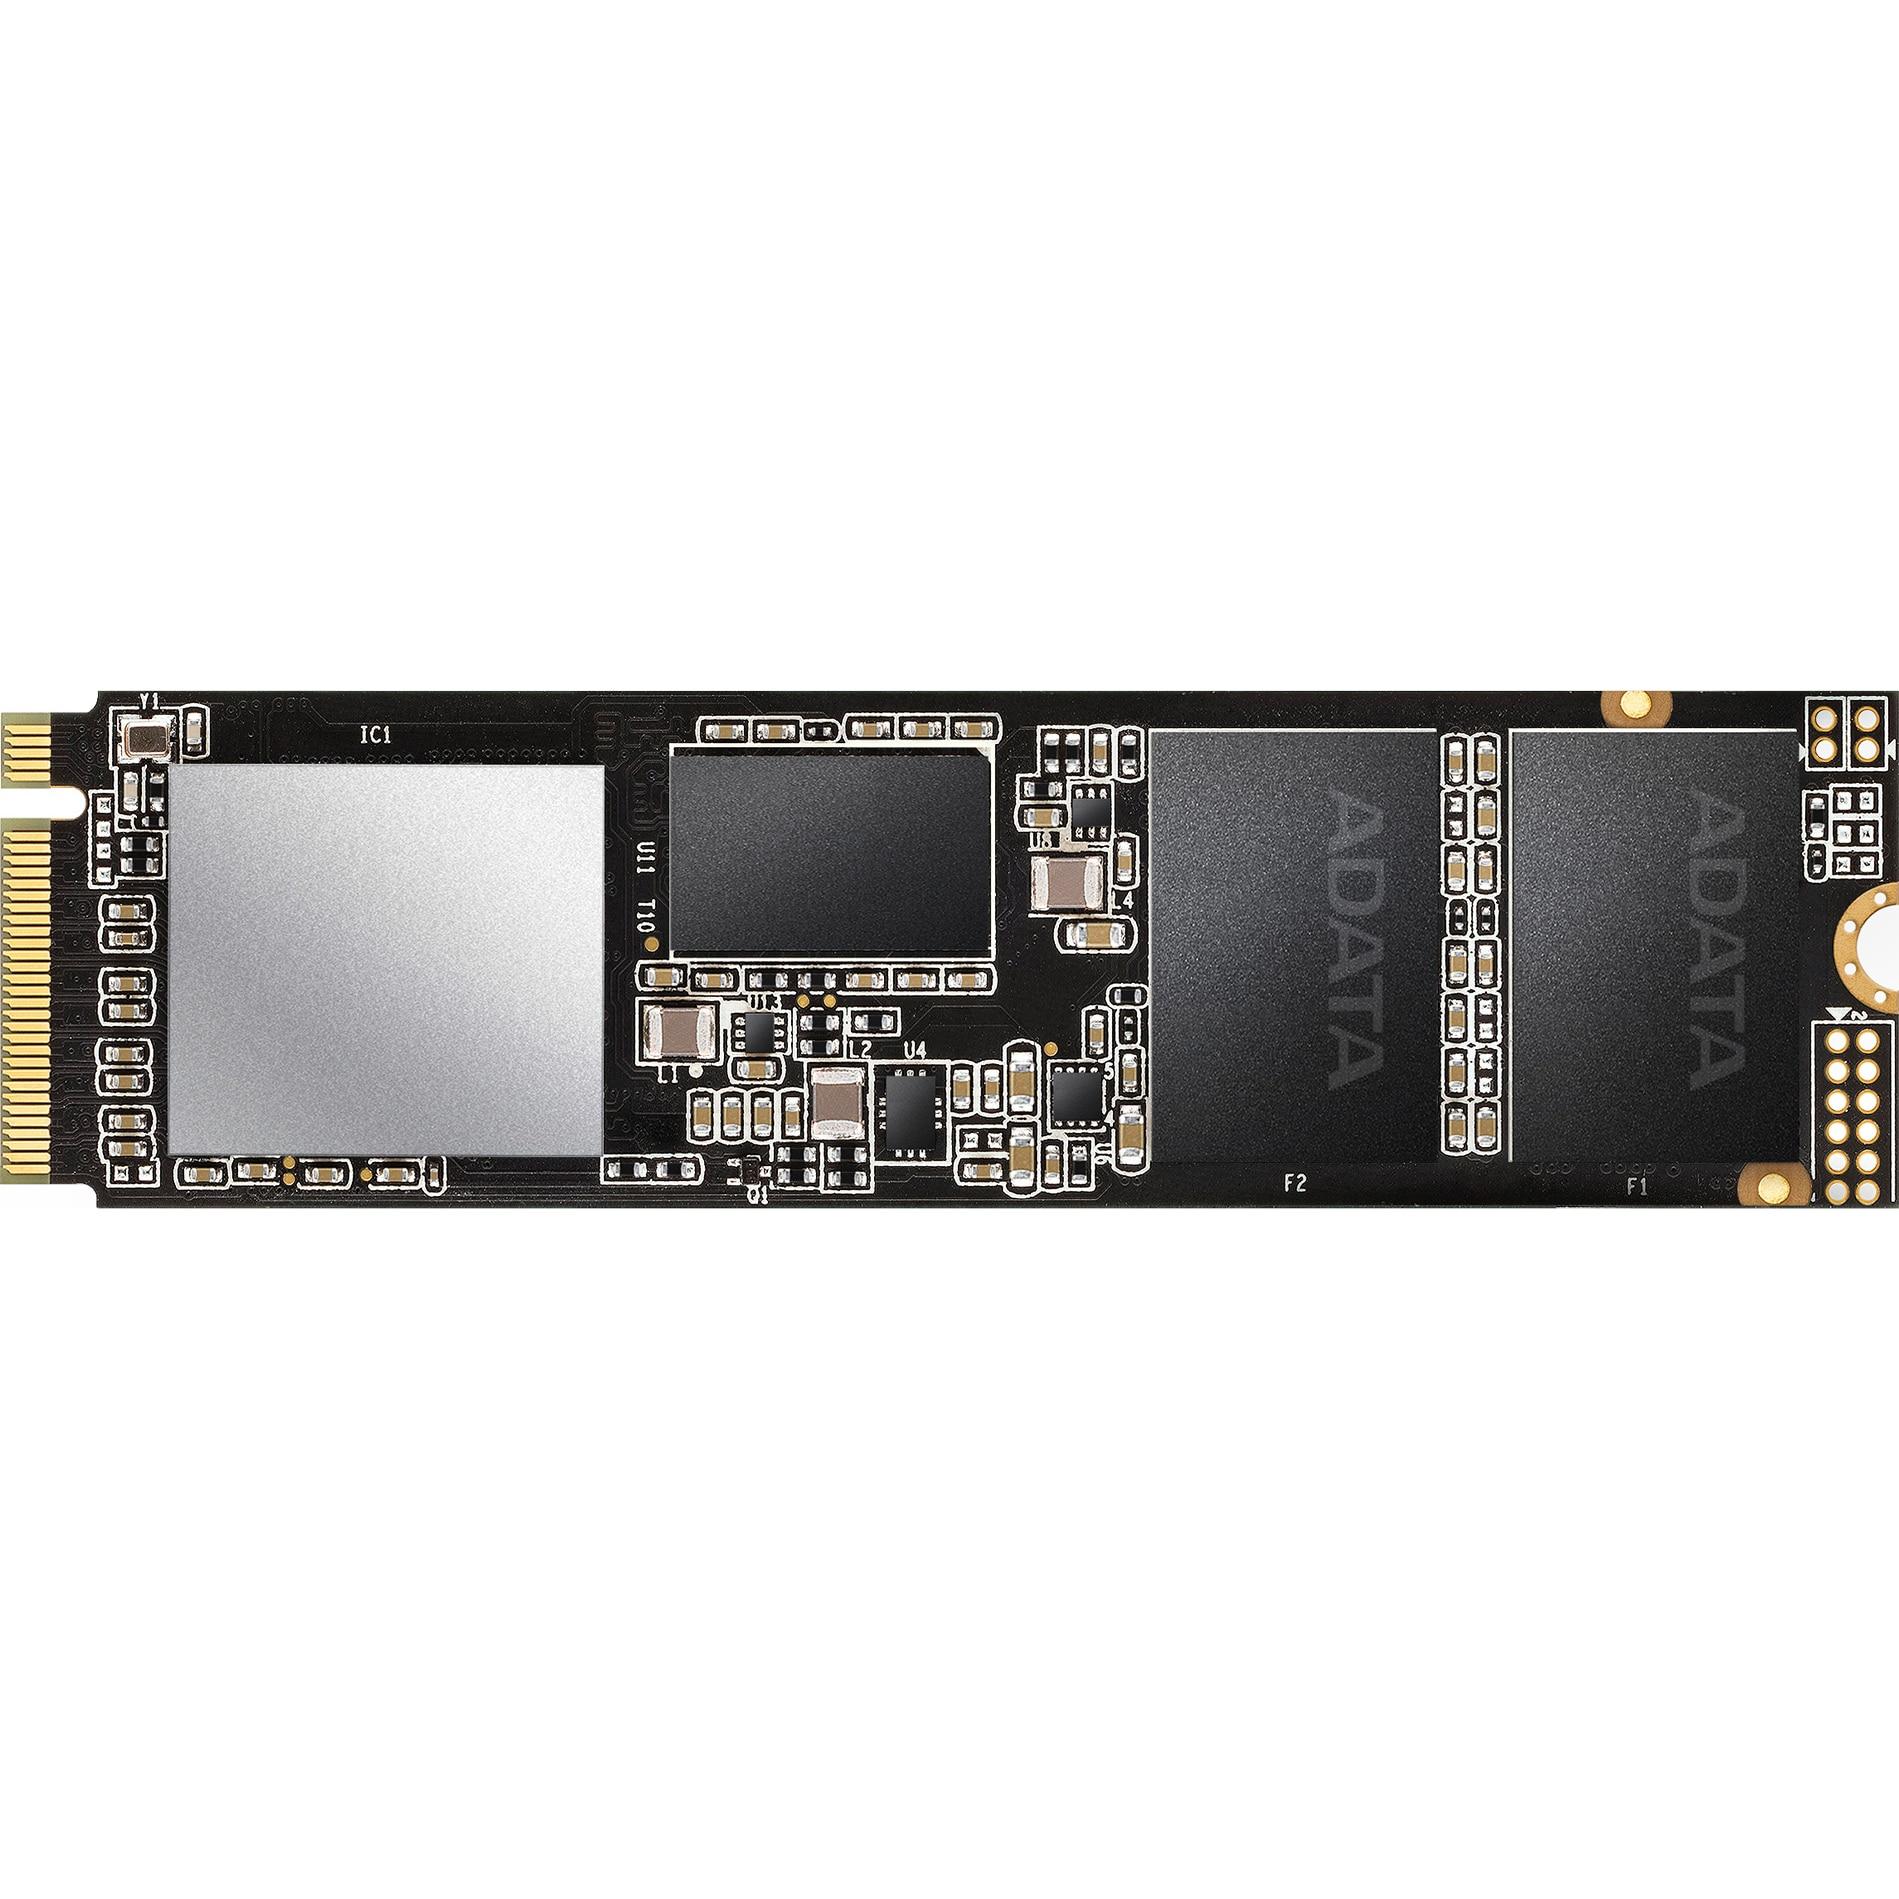 Fotografie Solid-State Drive (SSD) ADATA XPG SX8200 Pro 256GB, NVMe, M.2.